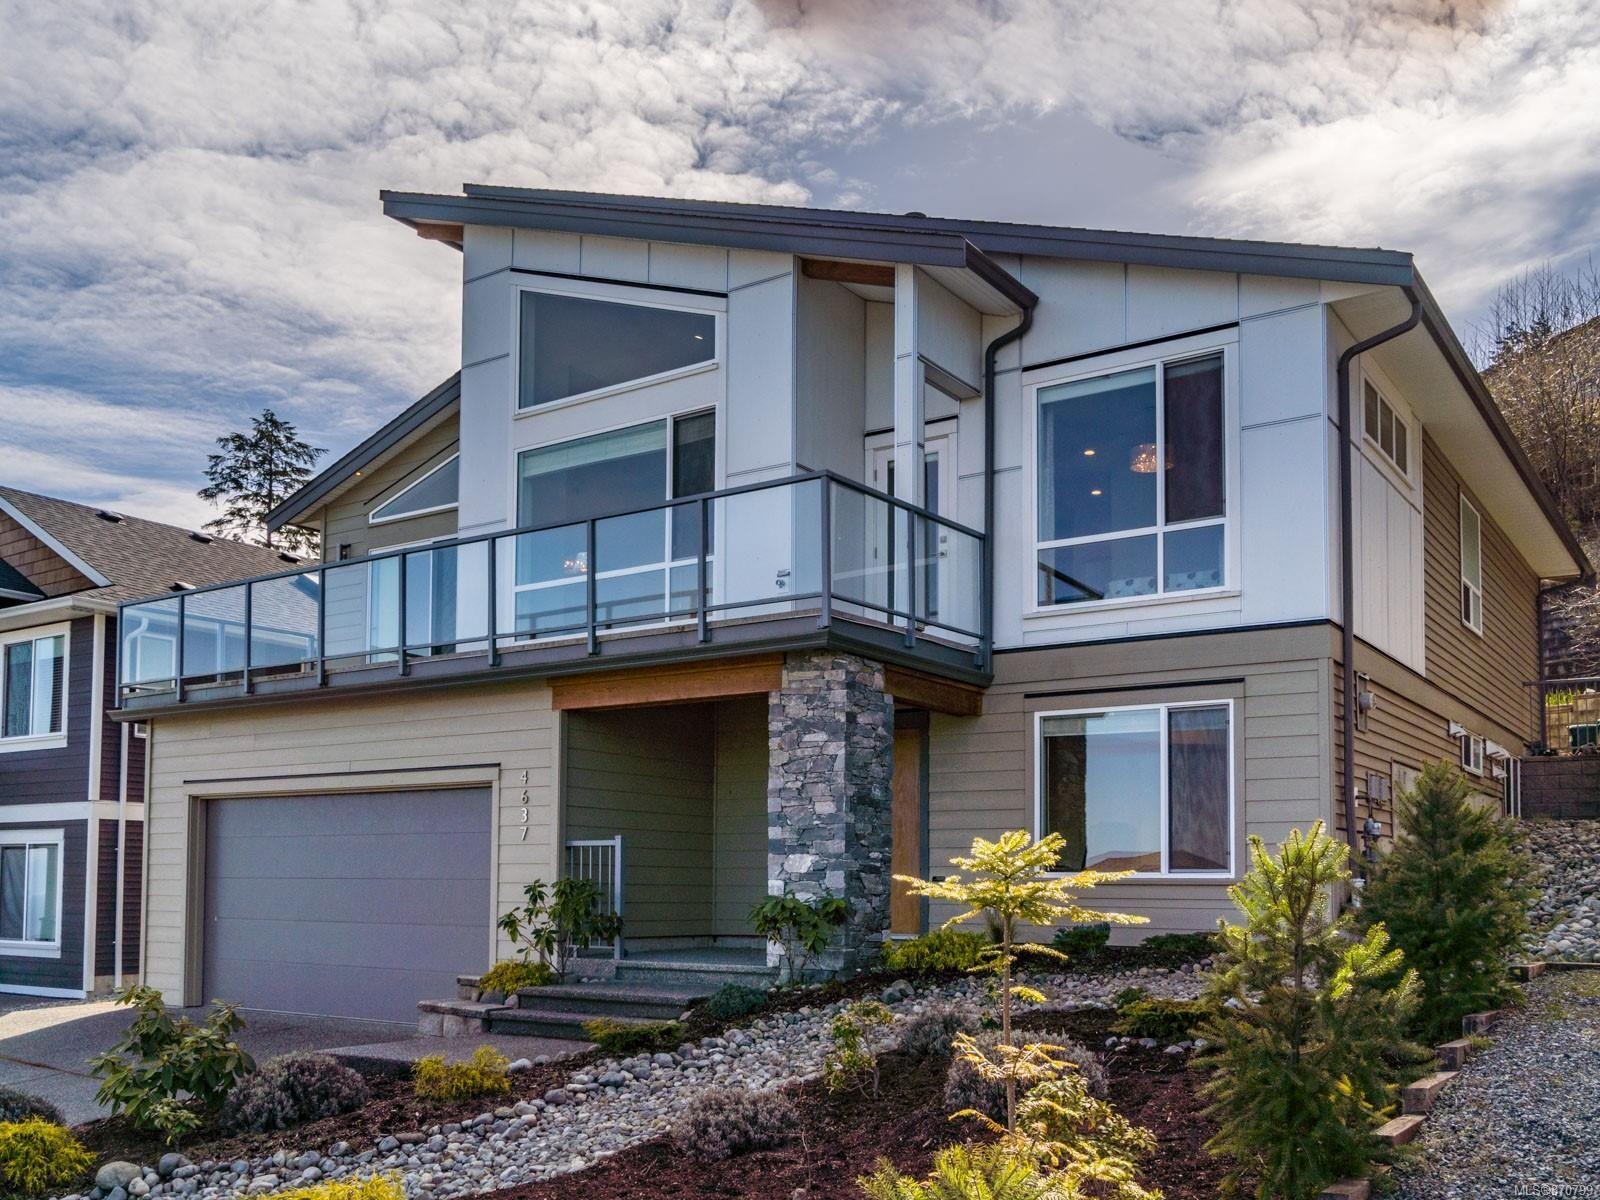 Main Photo: 4637 Laguna Way in : Na North Nanaimo House for sale (Nanaimo)  : MLS®# 870799